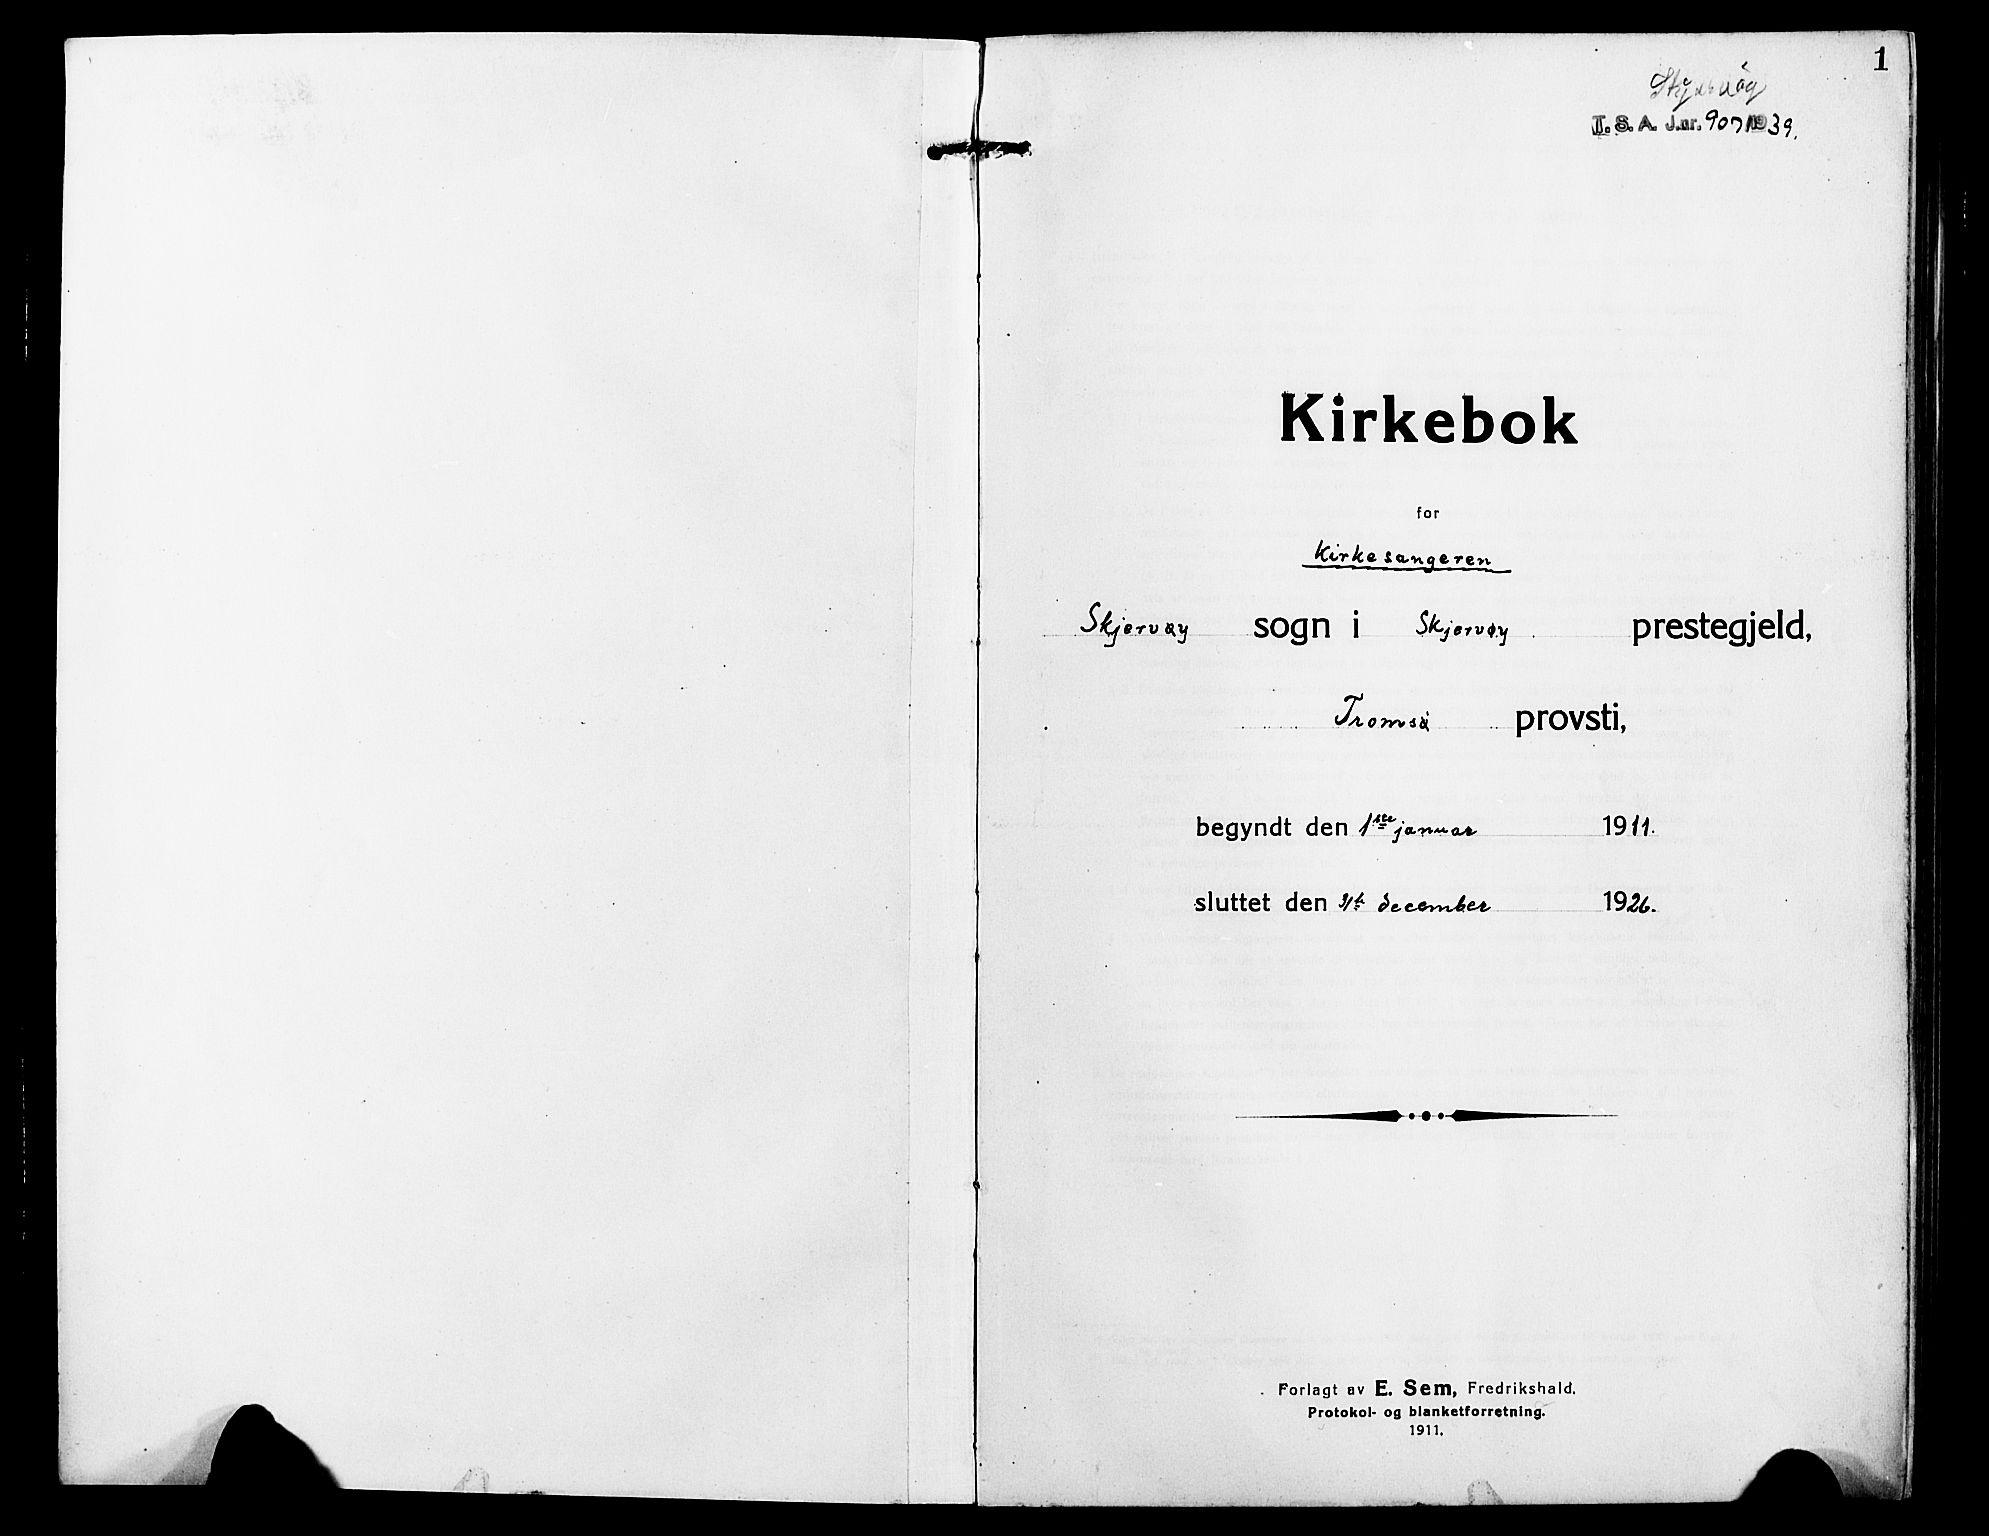 SATØ, Skjervøy sokneprestkontor, H/Ha/Hab/L0009klokker: Klokkerbok nr. 9, 1911-1926, s. 1